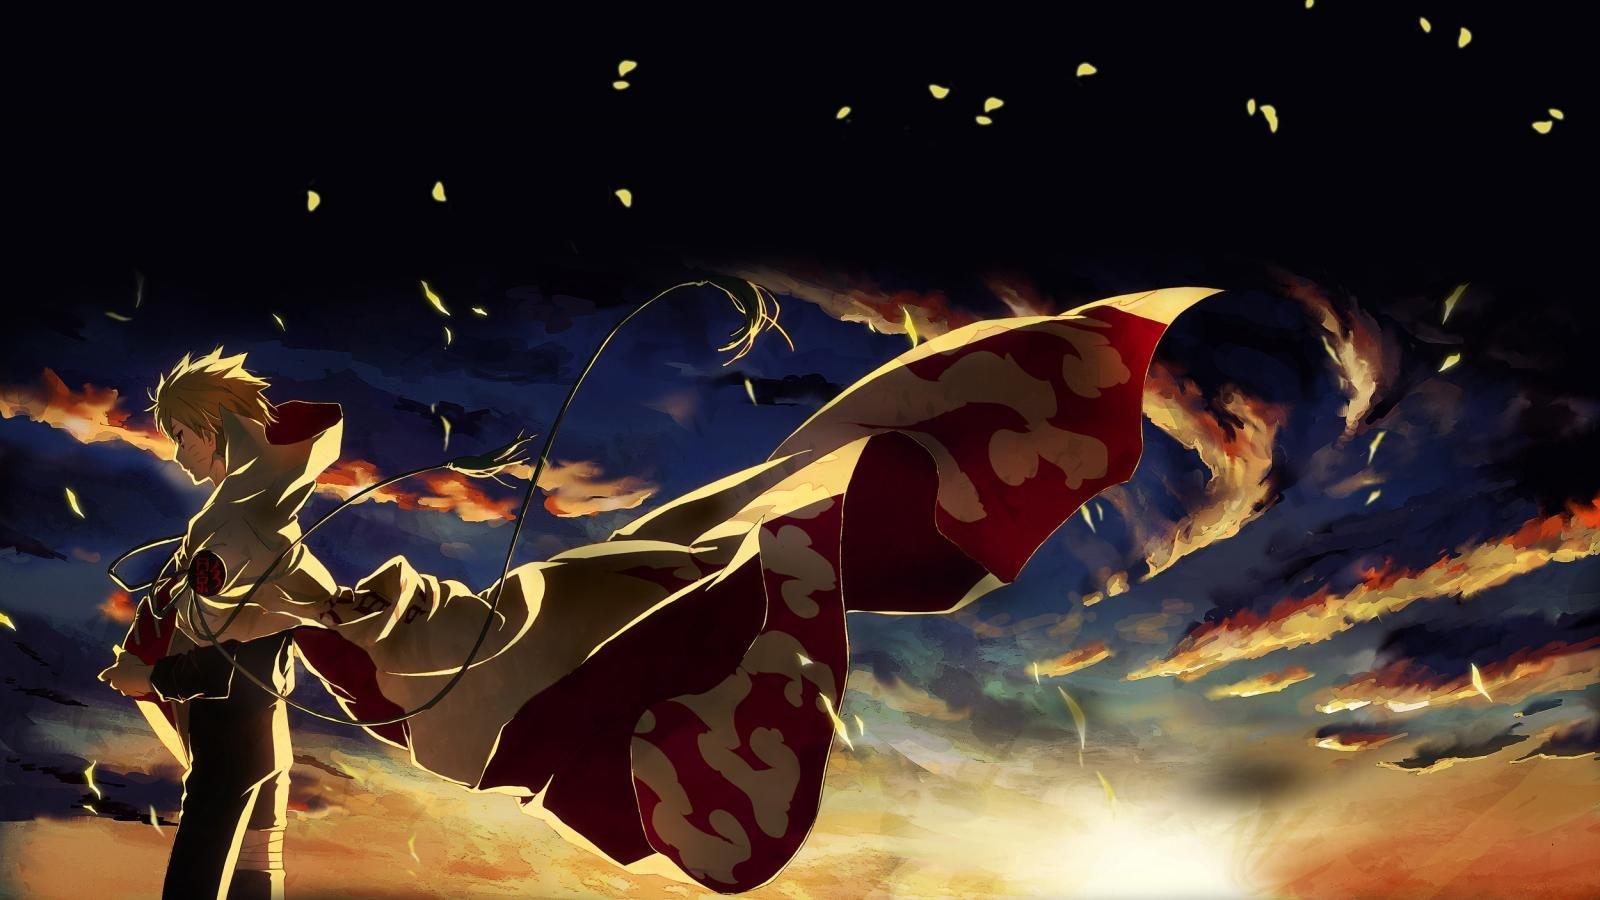 Anime Wallpapers 1600x900 Desktop Backgrounds